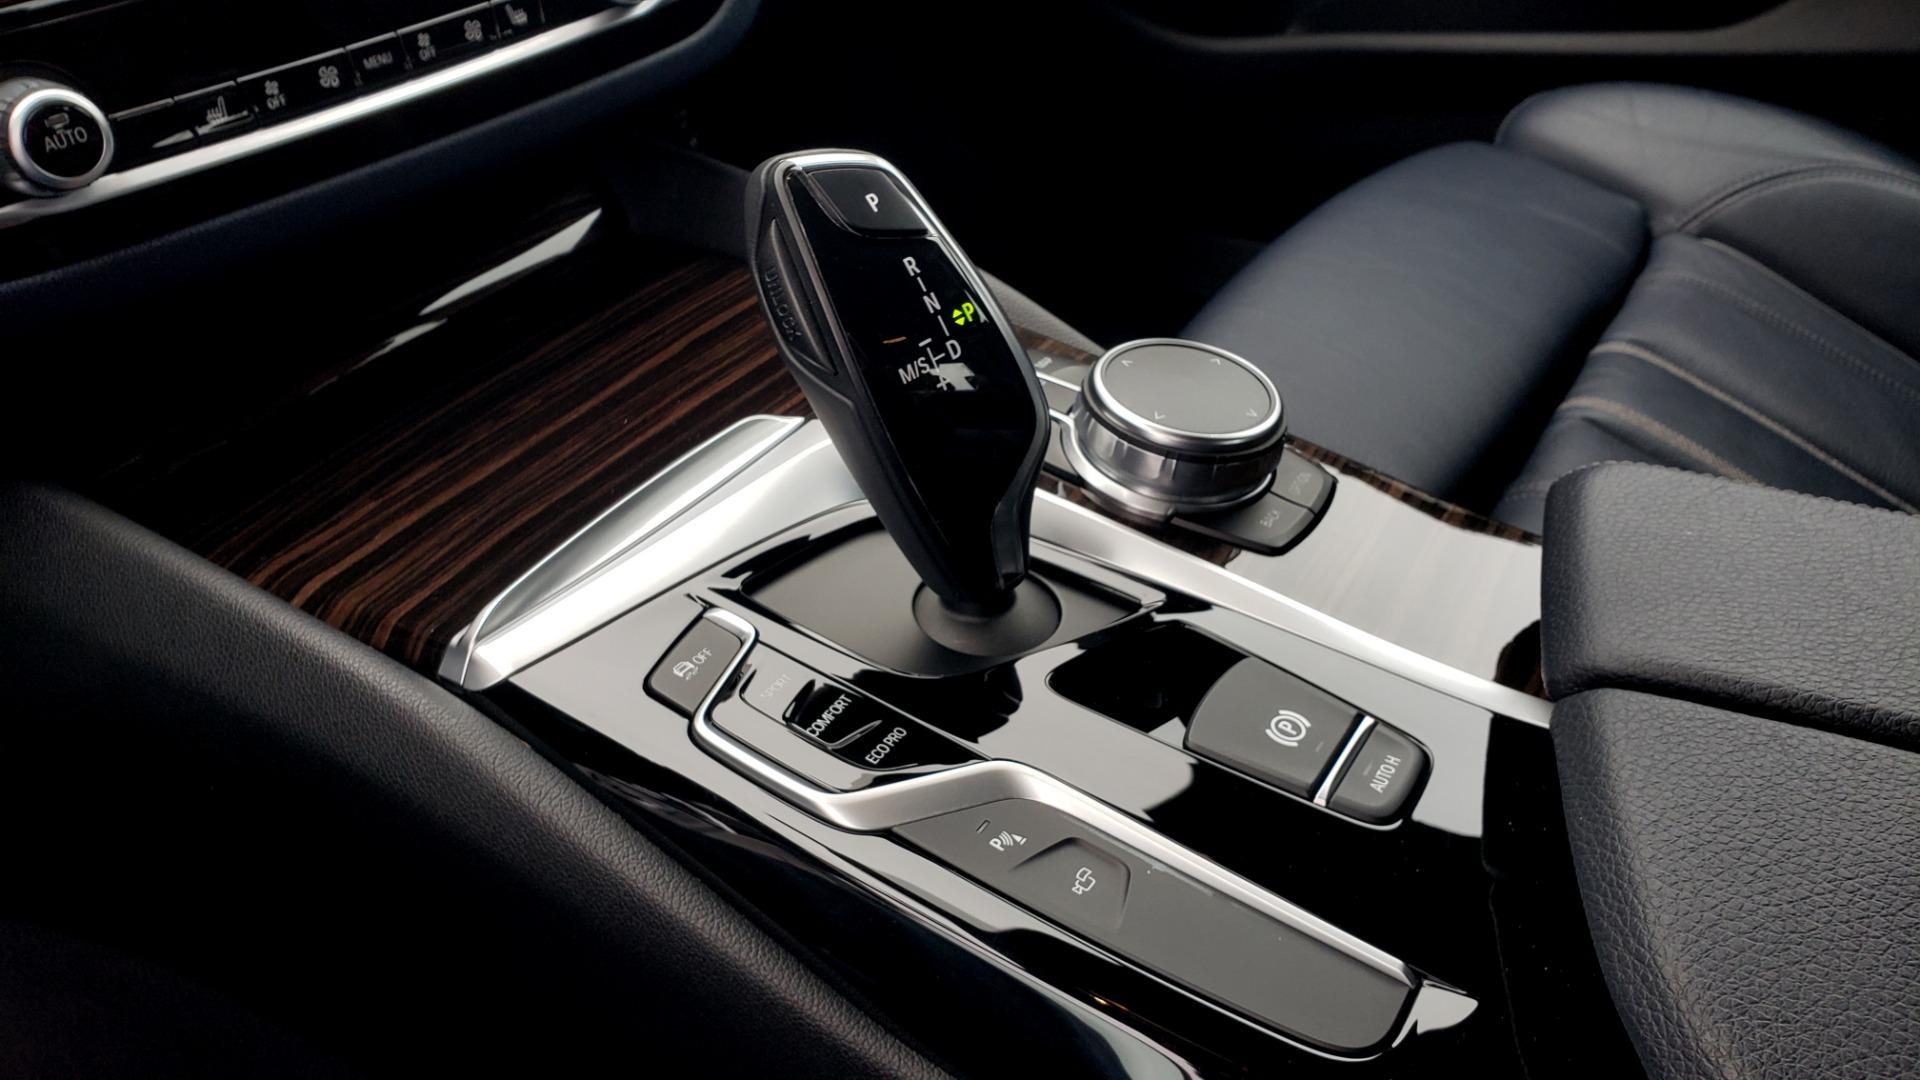 Used 2017 BMW 5 SERIES 530IXDRIVE / PREM PKG / DRVR ASST PLUS / CLD WTHR / APPLE CARPLAY for sale $30,595 at Formula Imports in Charlotte NC 28227 49